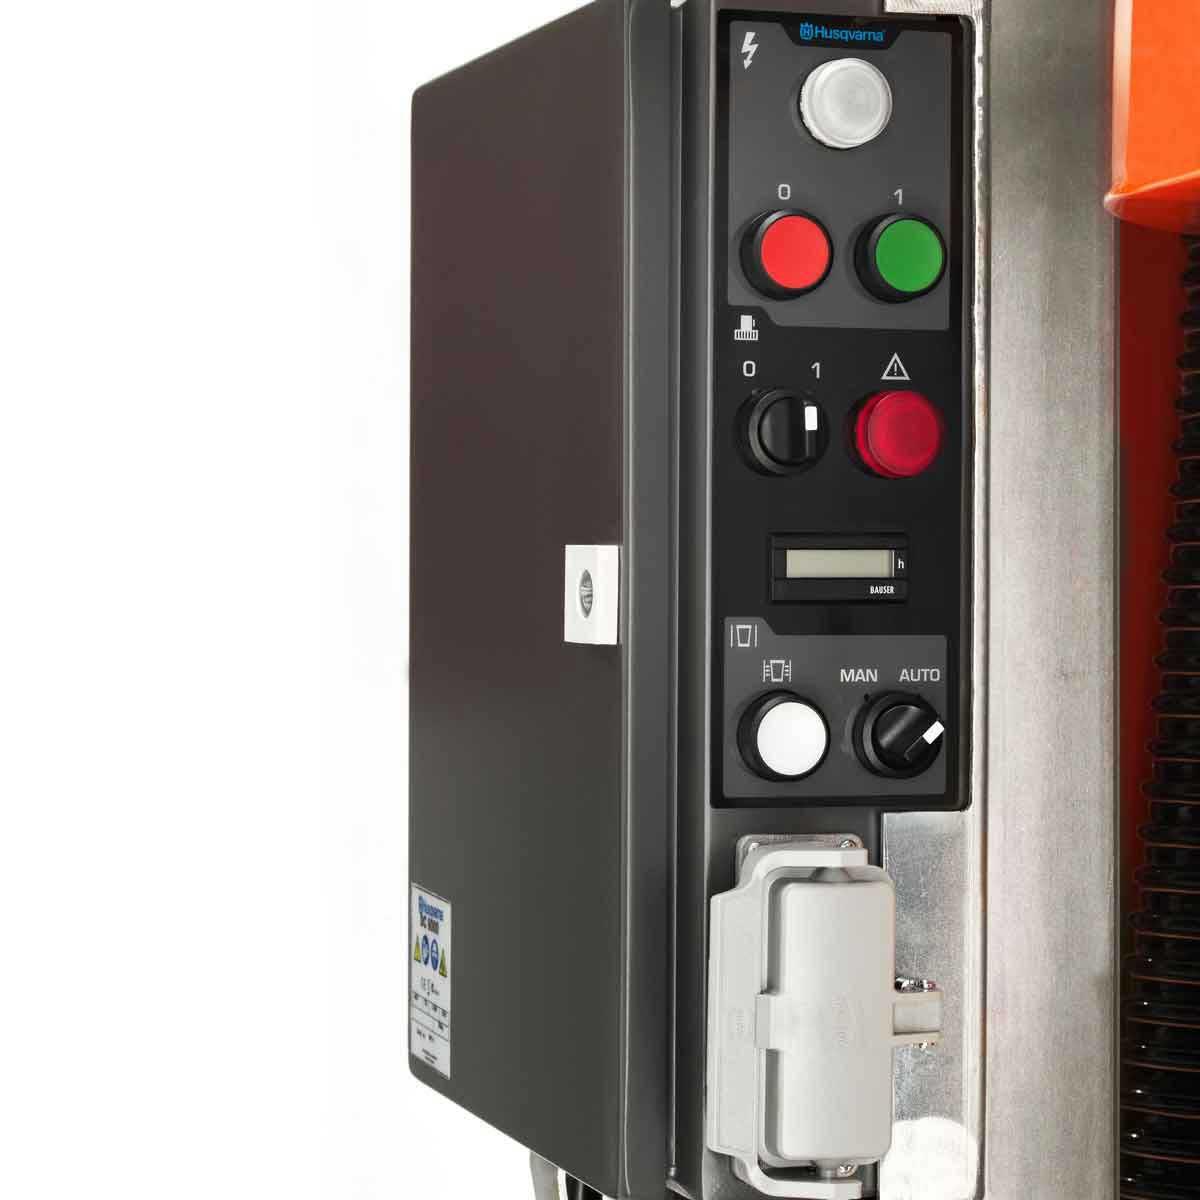 Husqvarna DC6000 vacuum grill